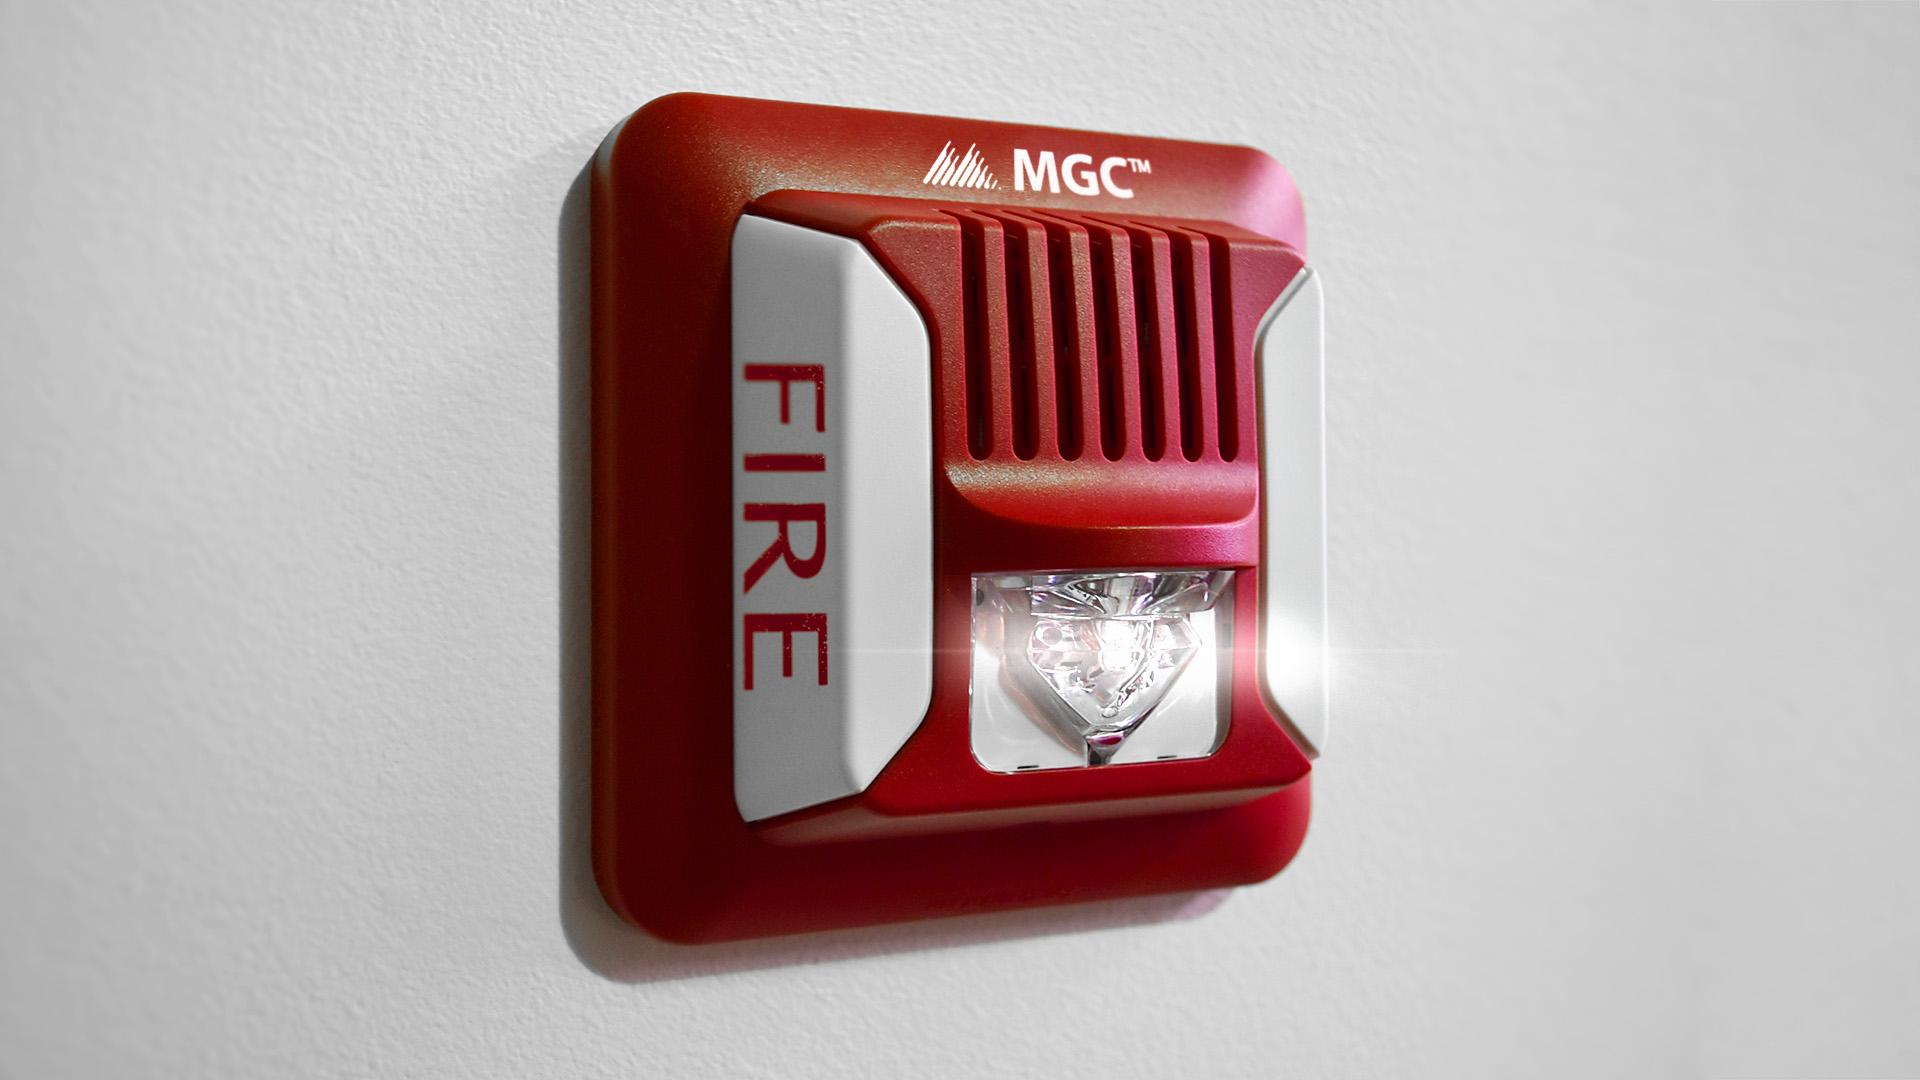 Mircom Fire Alarm Surfaceid